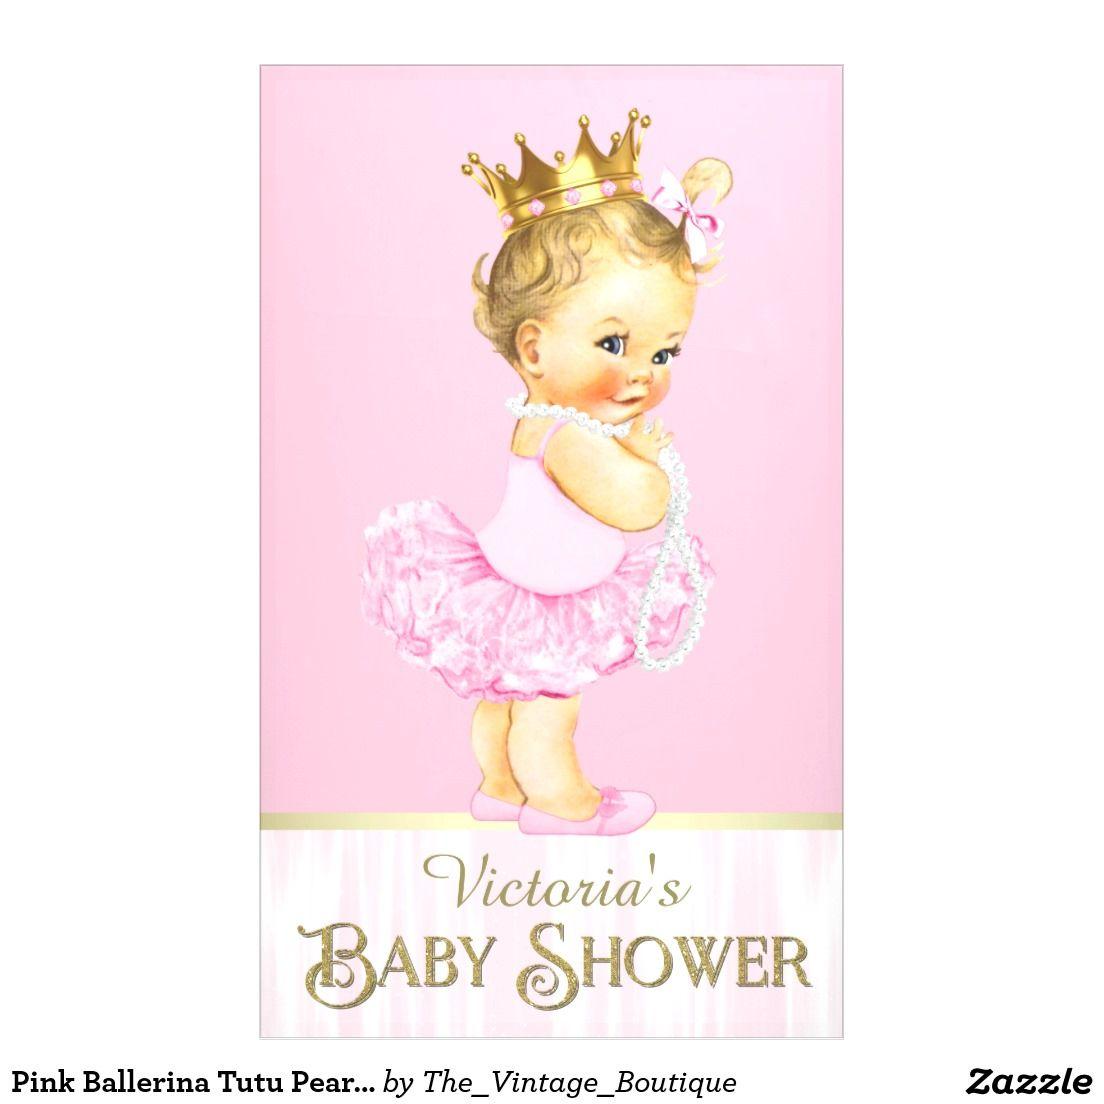 Pink Ballerina Tutu Pearl Baby Shower Banner Zazzle Com Baby Shower Banner Baby Shower Princess Ballerina Baby Showers